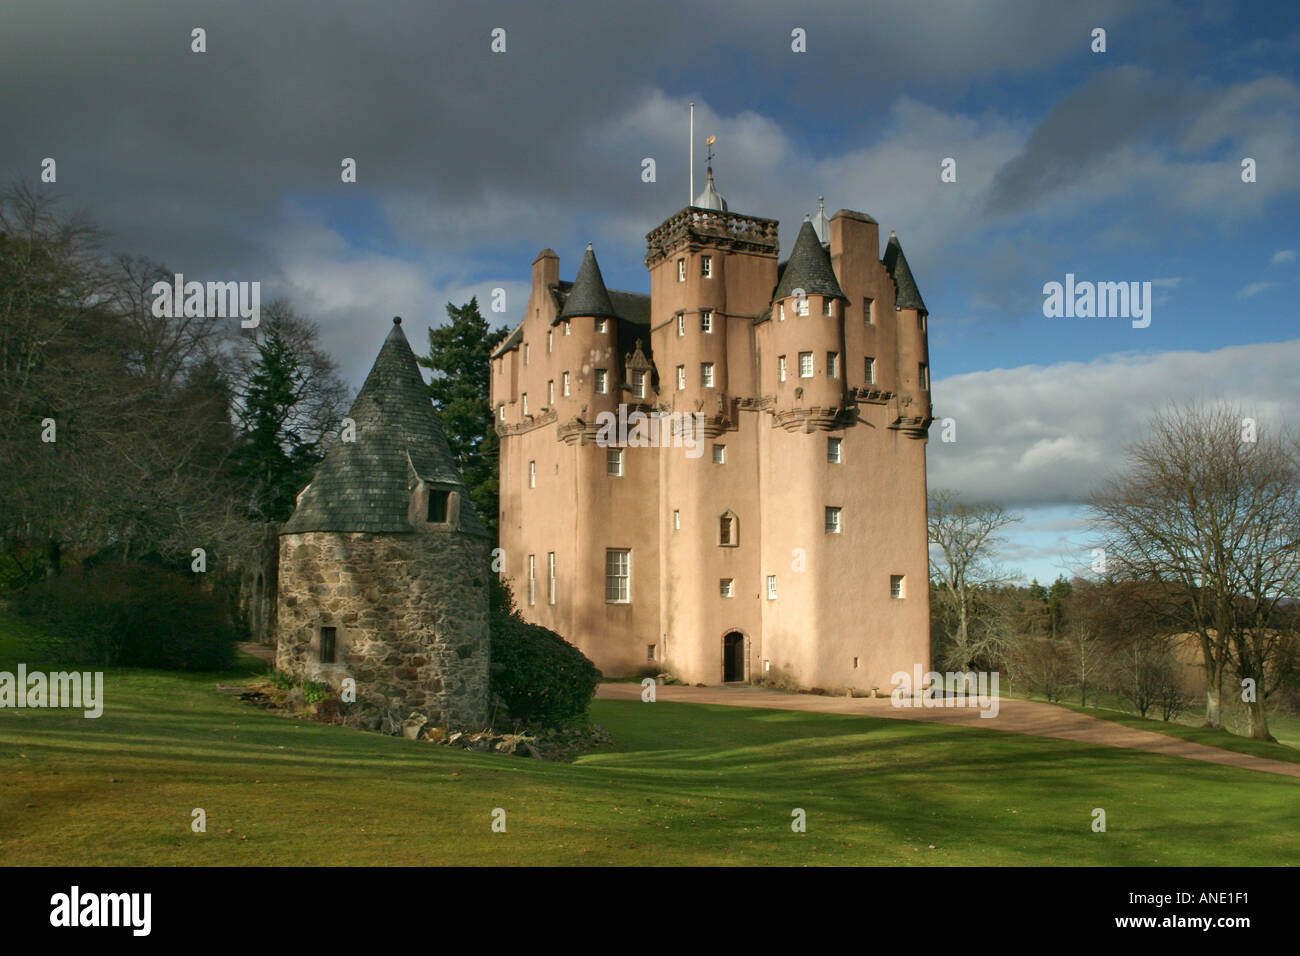 Craigievar Castle - Stock Image